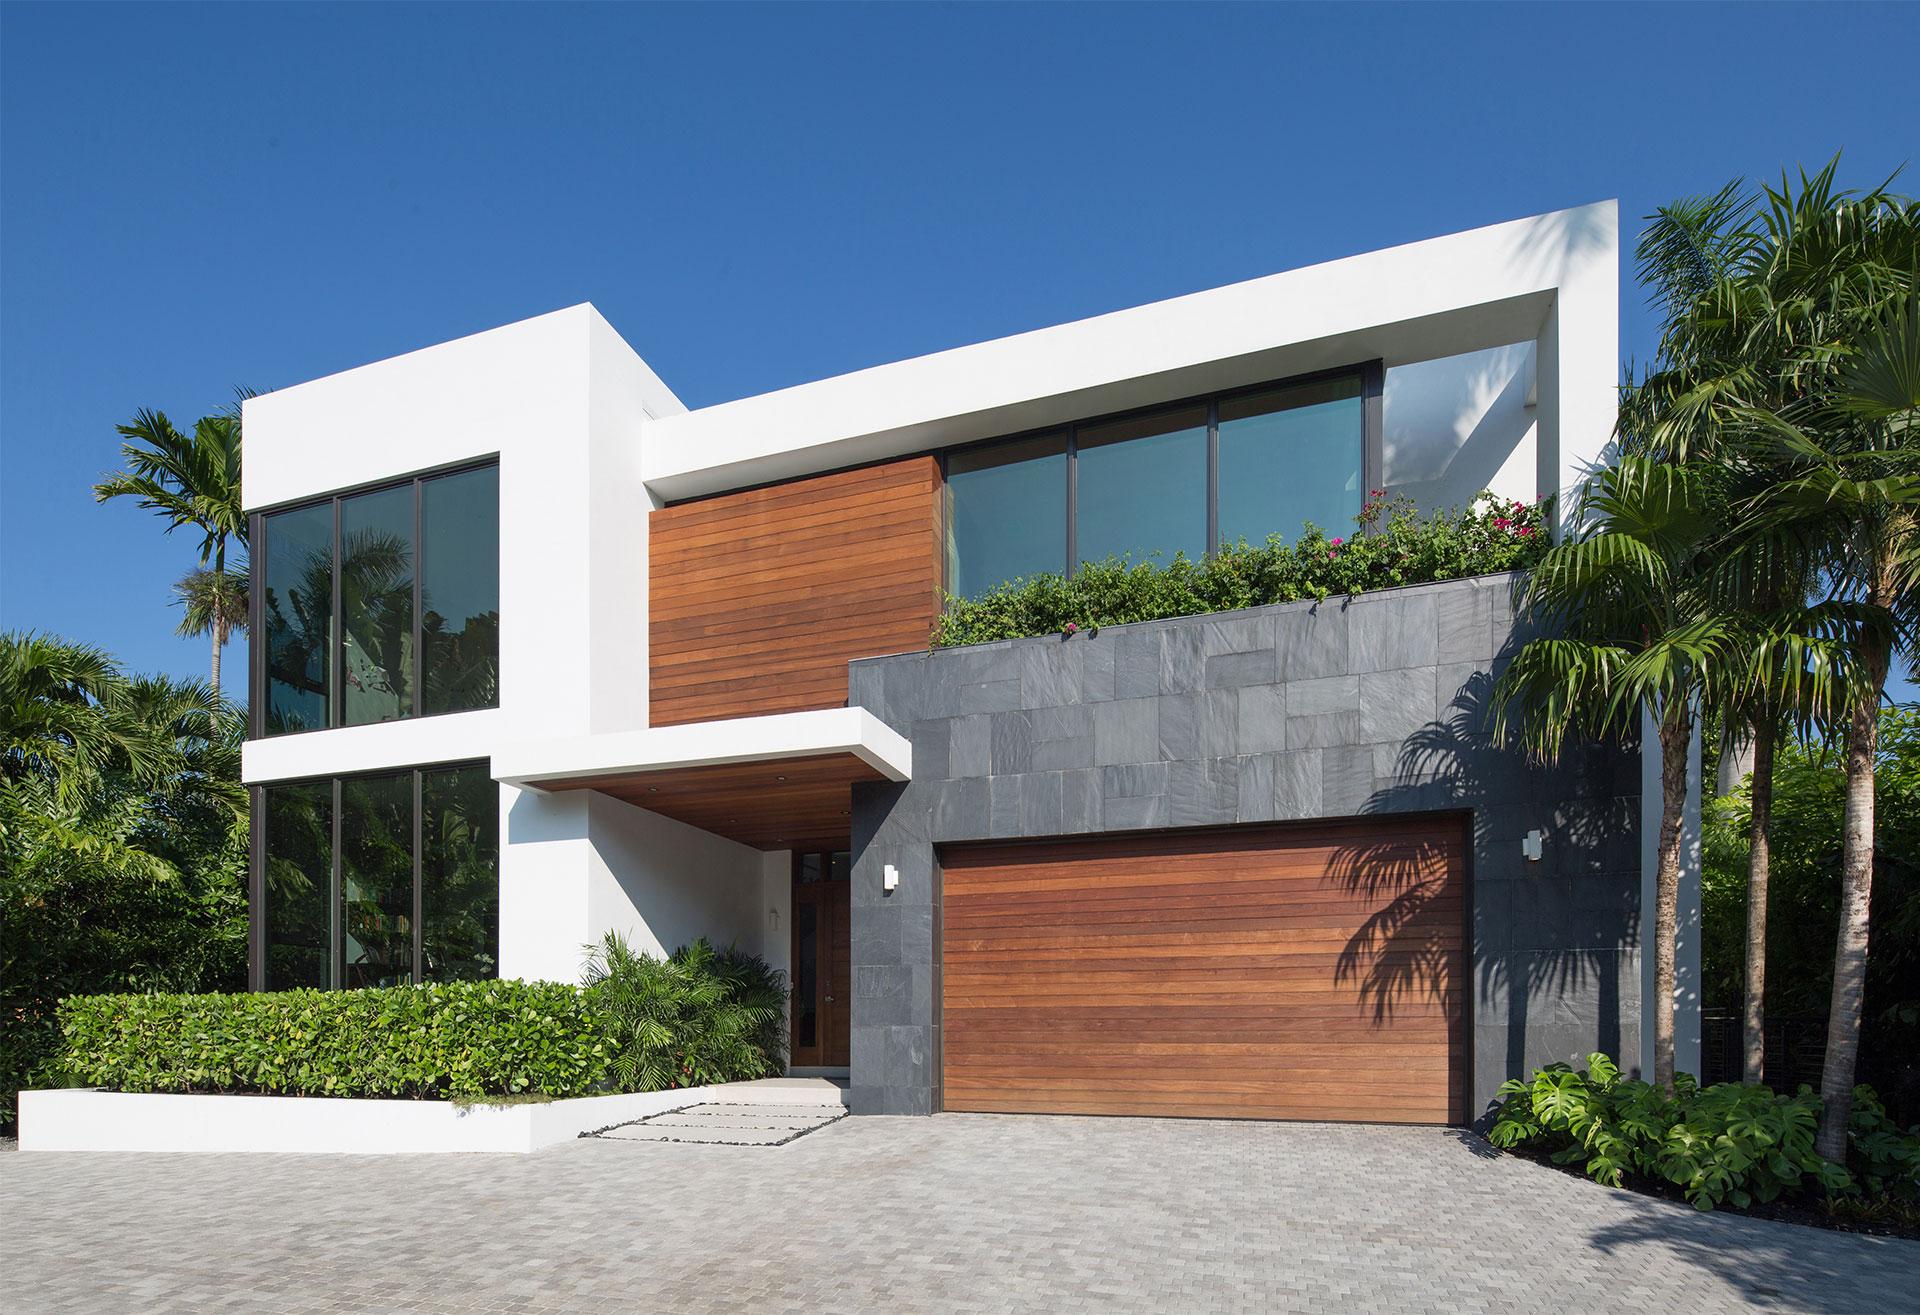 Architecture project in 475 Center Island Drive, Florida